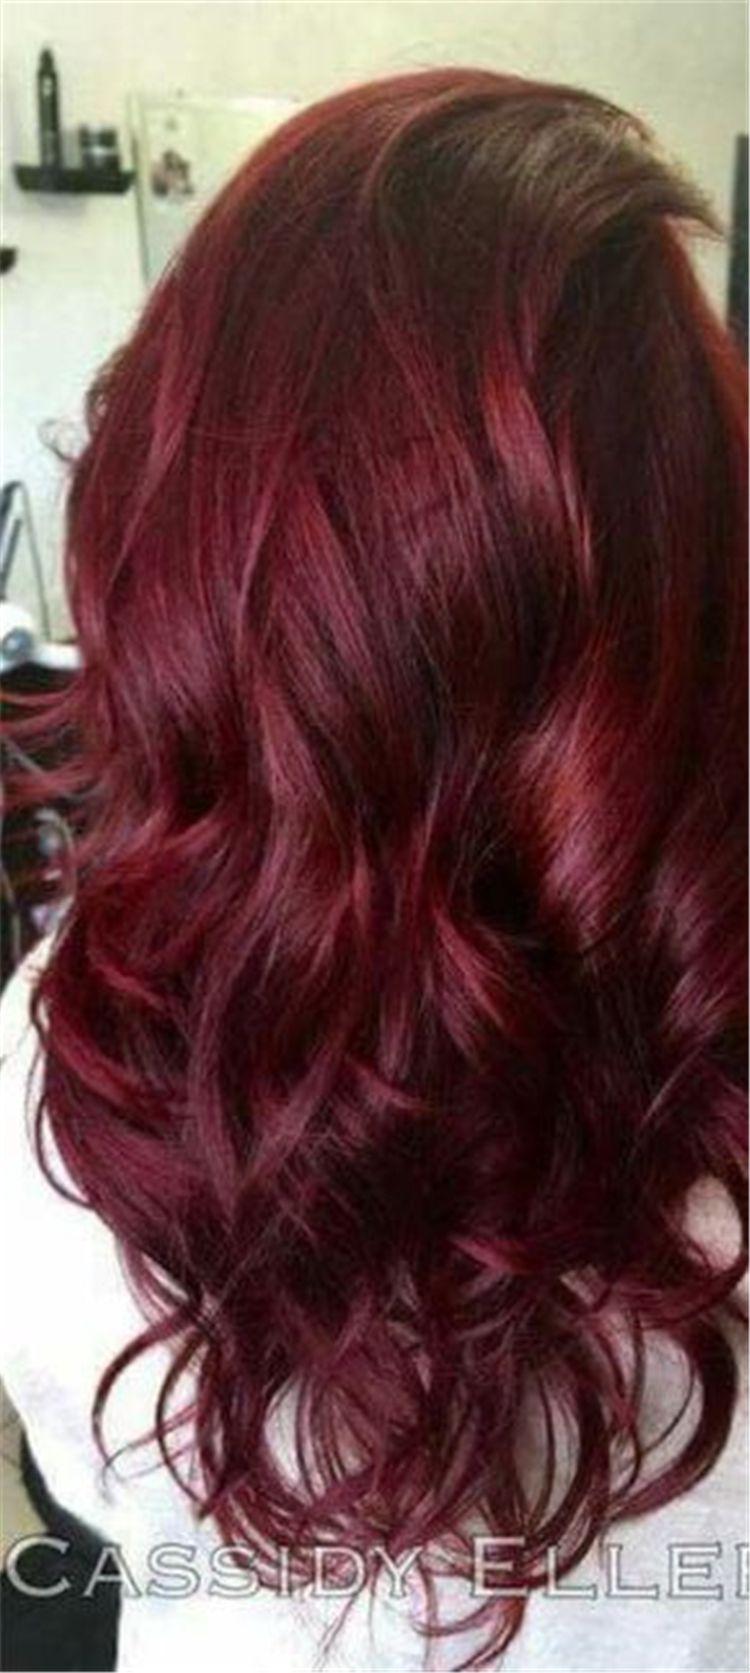 25 Burgundy Hair Color Ideas In 2019 Violet Hair Colors Hair Styles Red Violet Hair